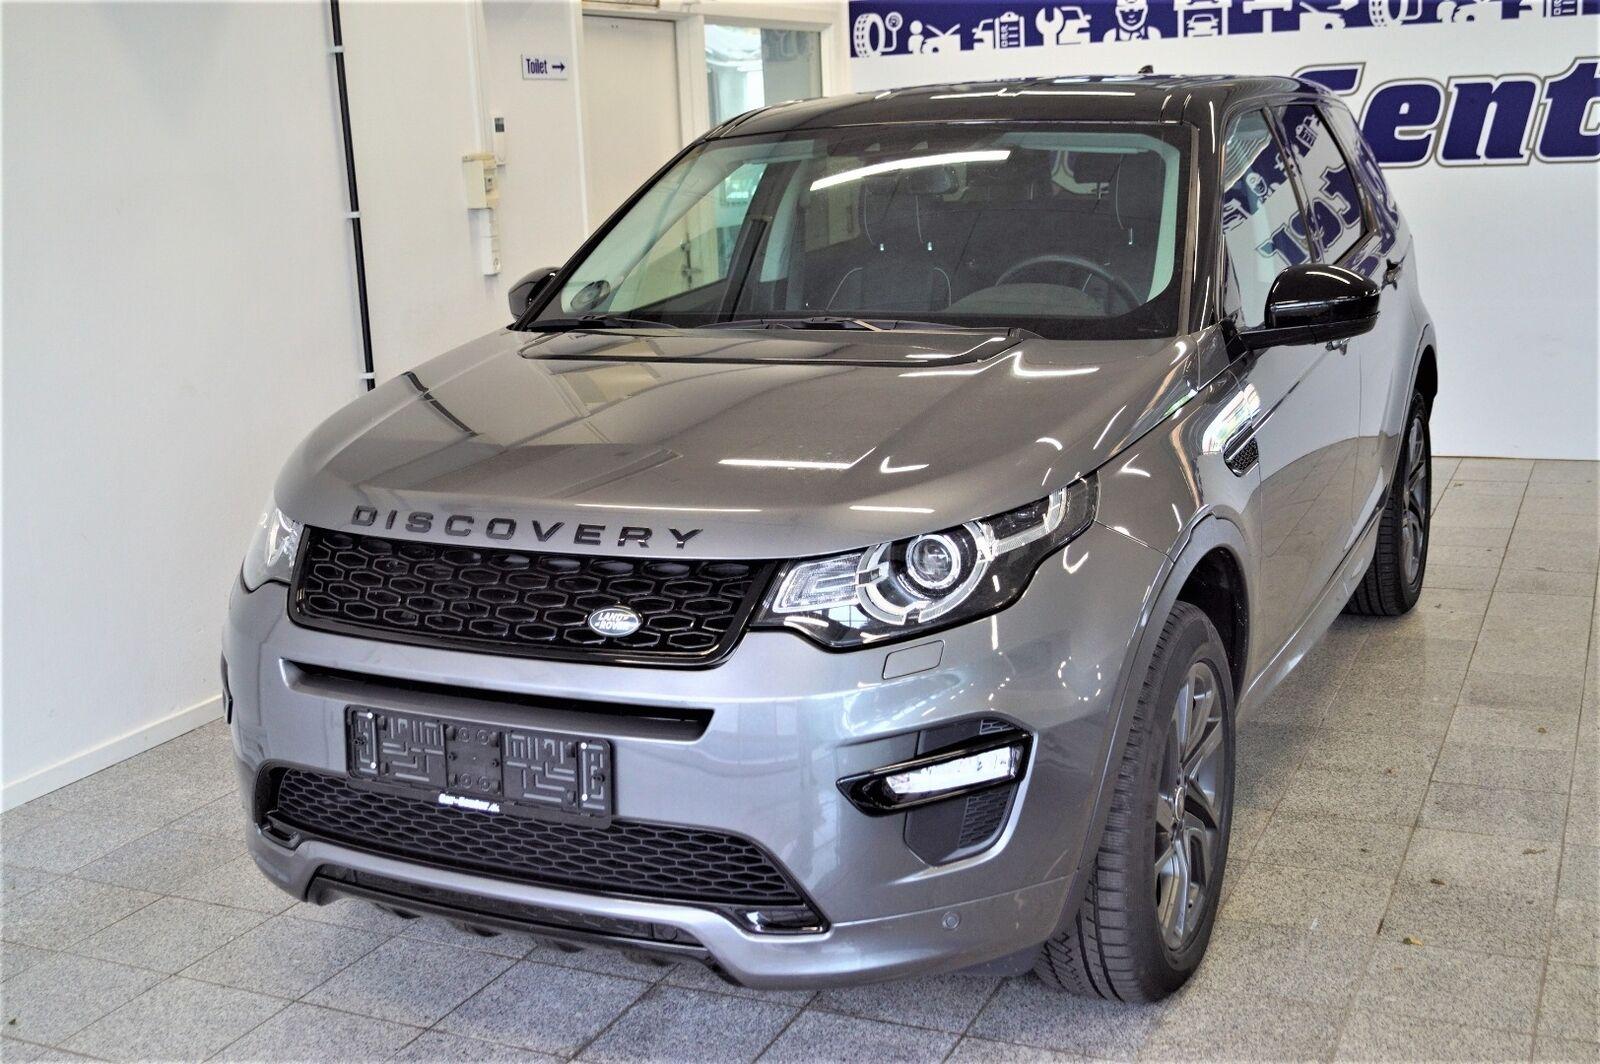 Land Rover Discovery Sport 2,0 TD4 180 SE aut. 5d - 549.900 kr.